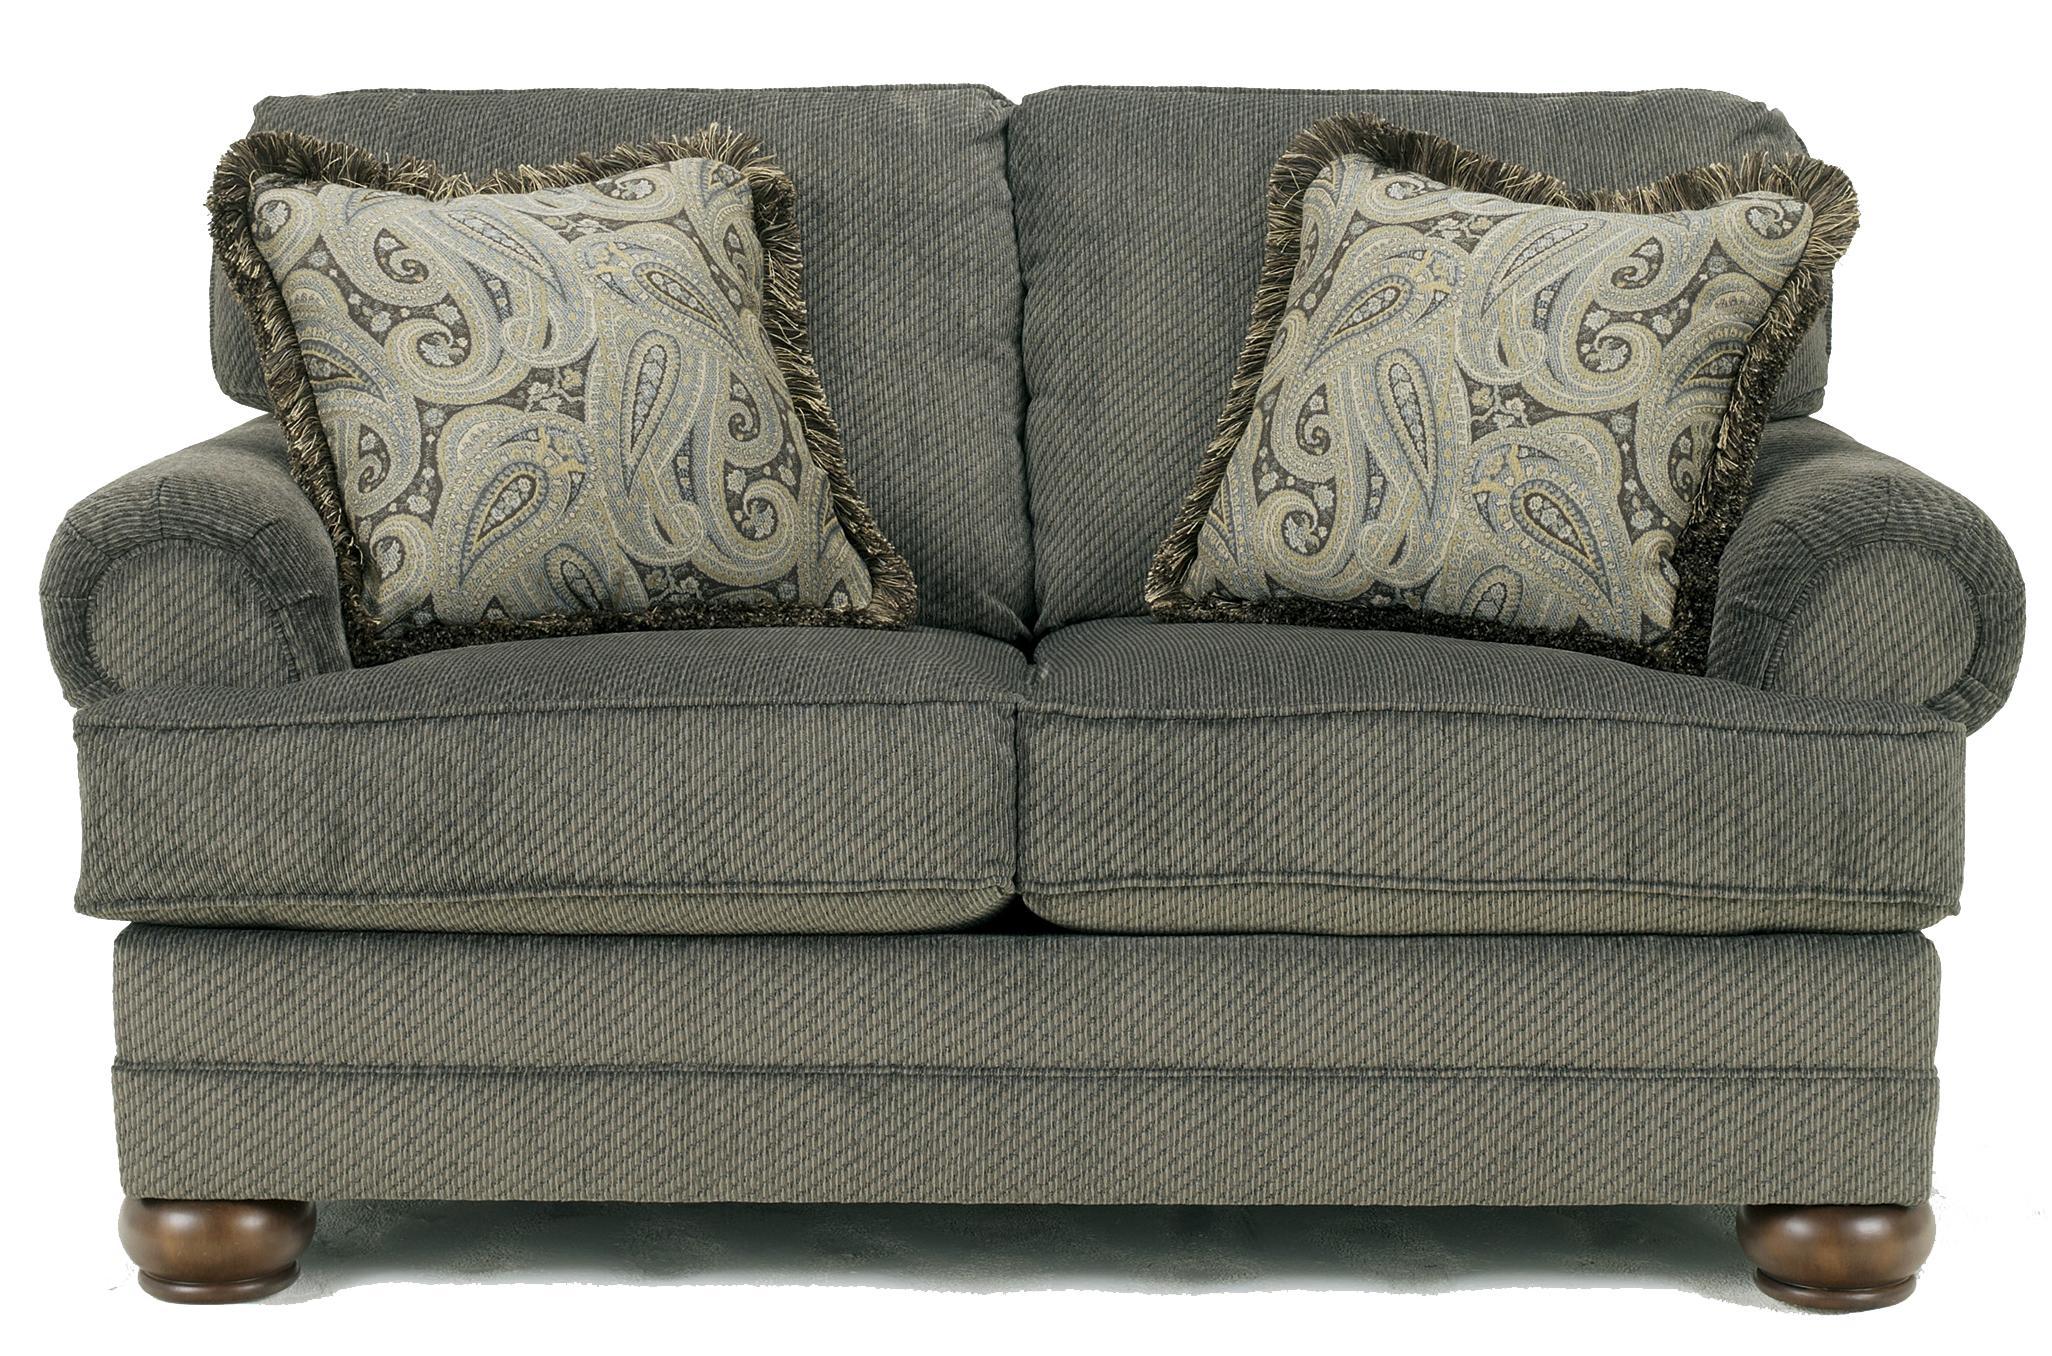 Signature Design by Ashley Parcal Estates - Basil Loveseat - Item Number: 7400535